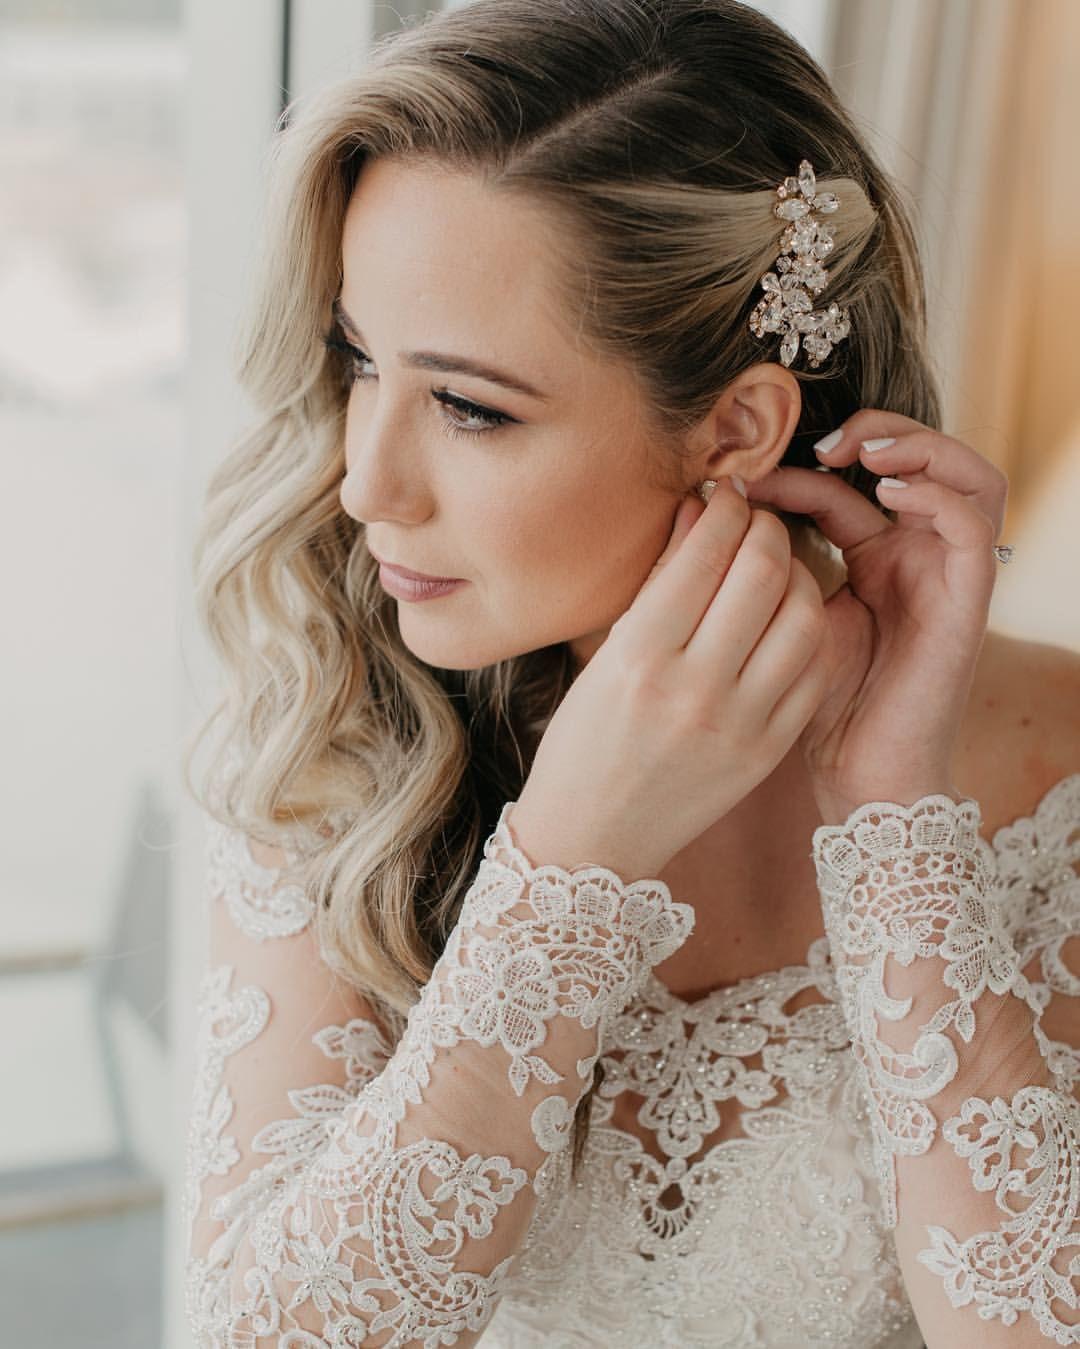 Bridal Makeup And Side Swept Curls Wedding Hair Side Bridal Hair Side Swept Bridal Hair Down